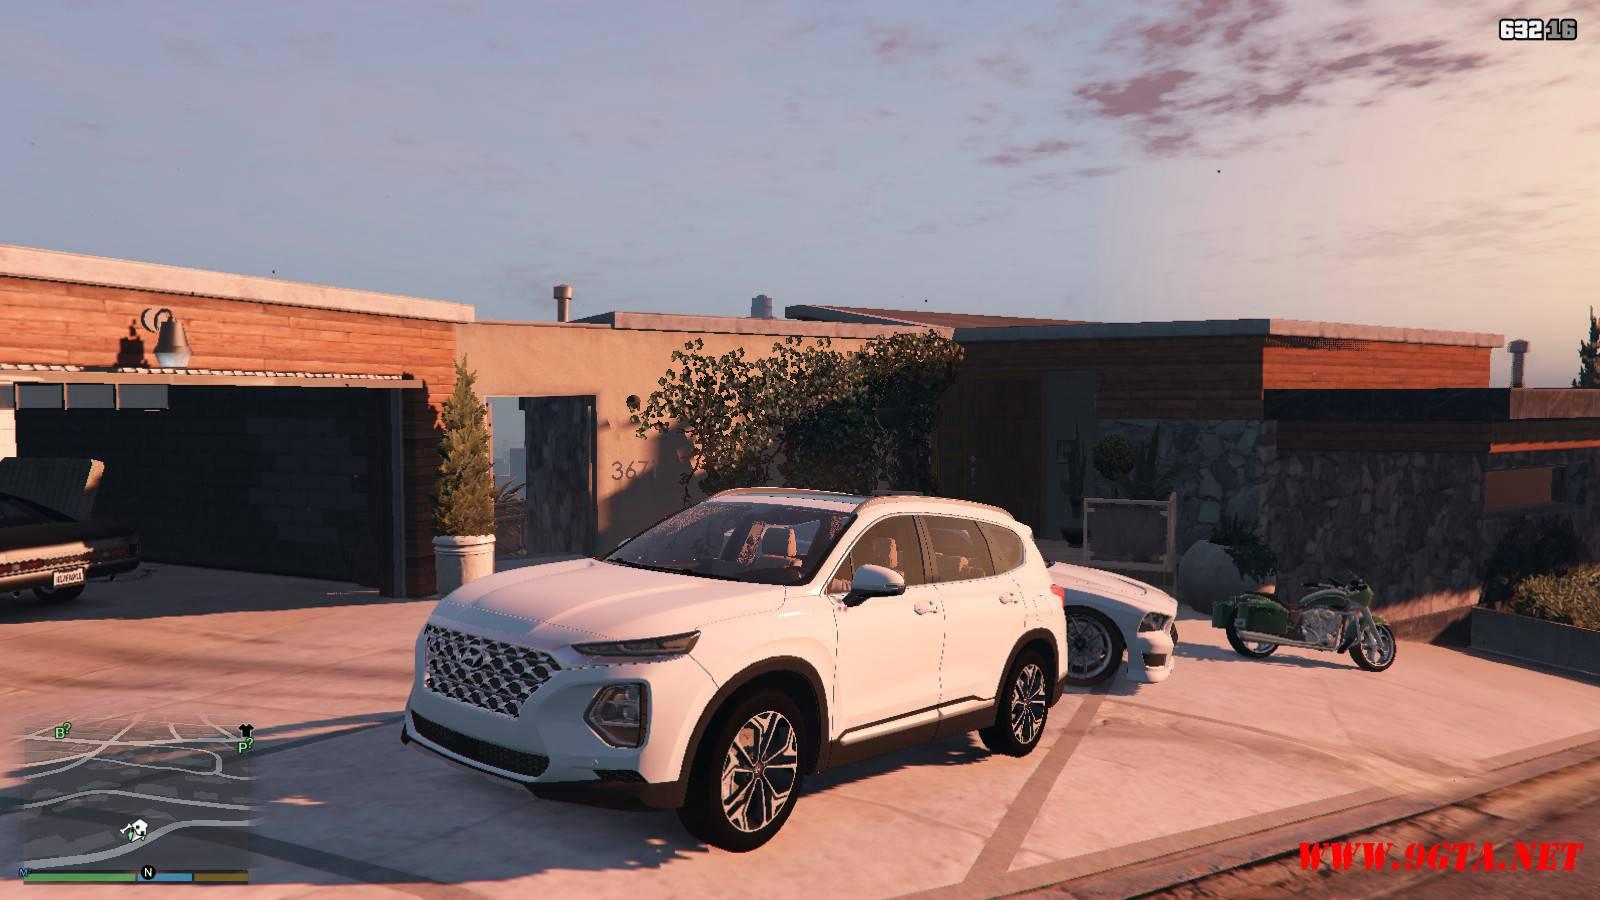 2019 Huyndai Santa Fe GTA5 mods (1)